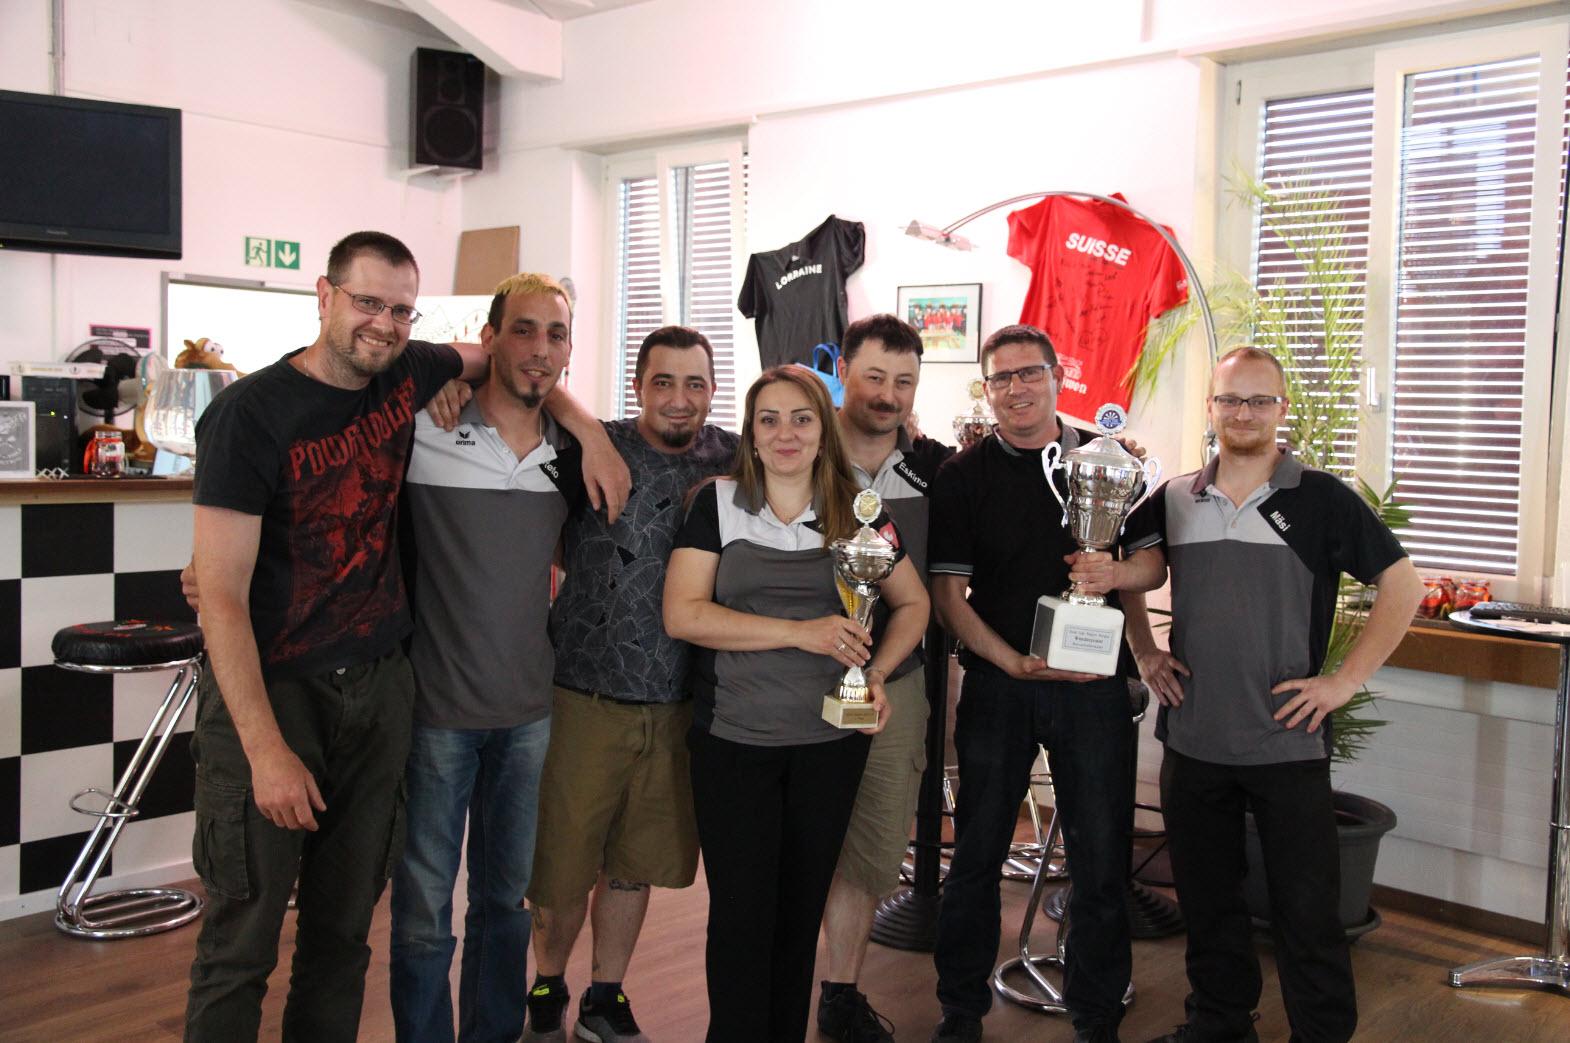 DLRA Meisterschaft 2017/18 - 1. Rang - Steeli con Carne